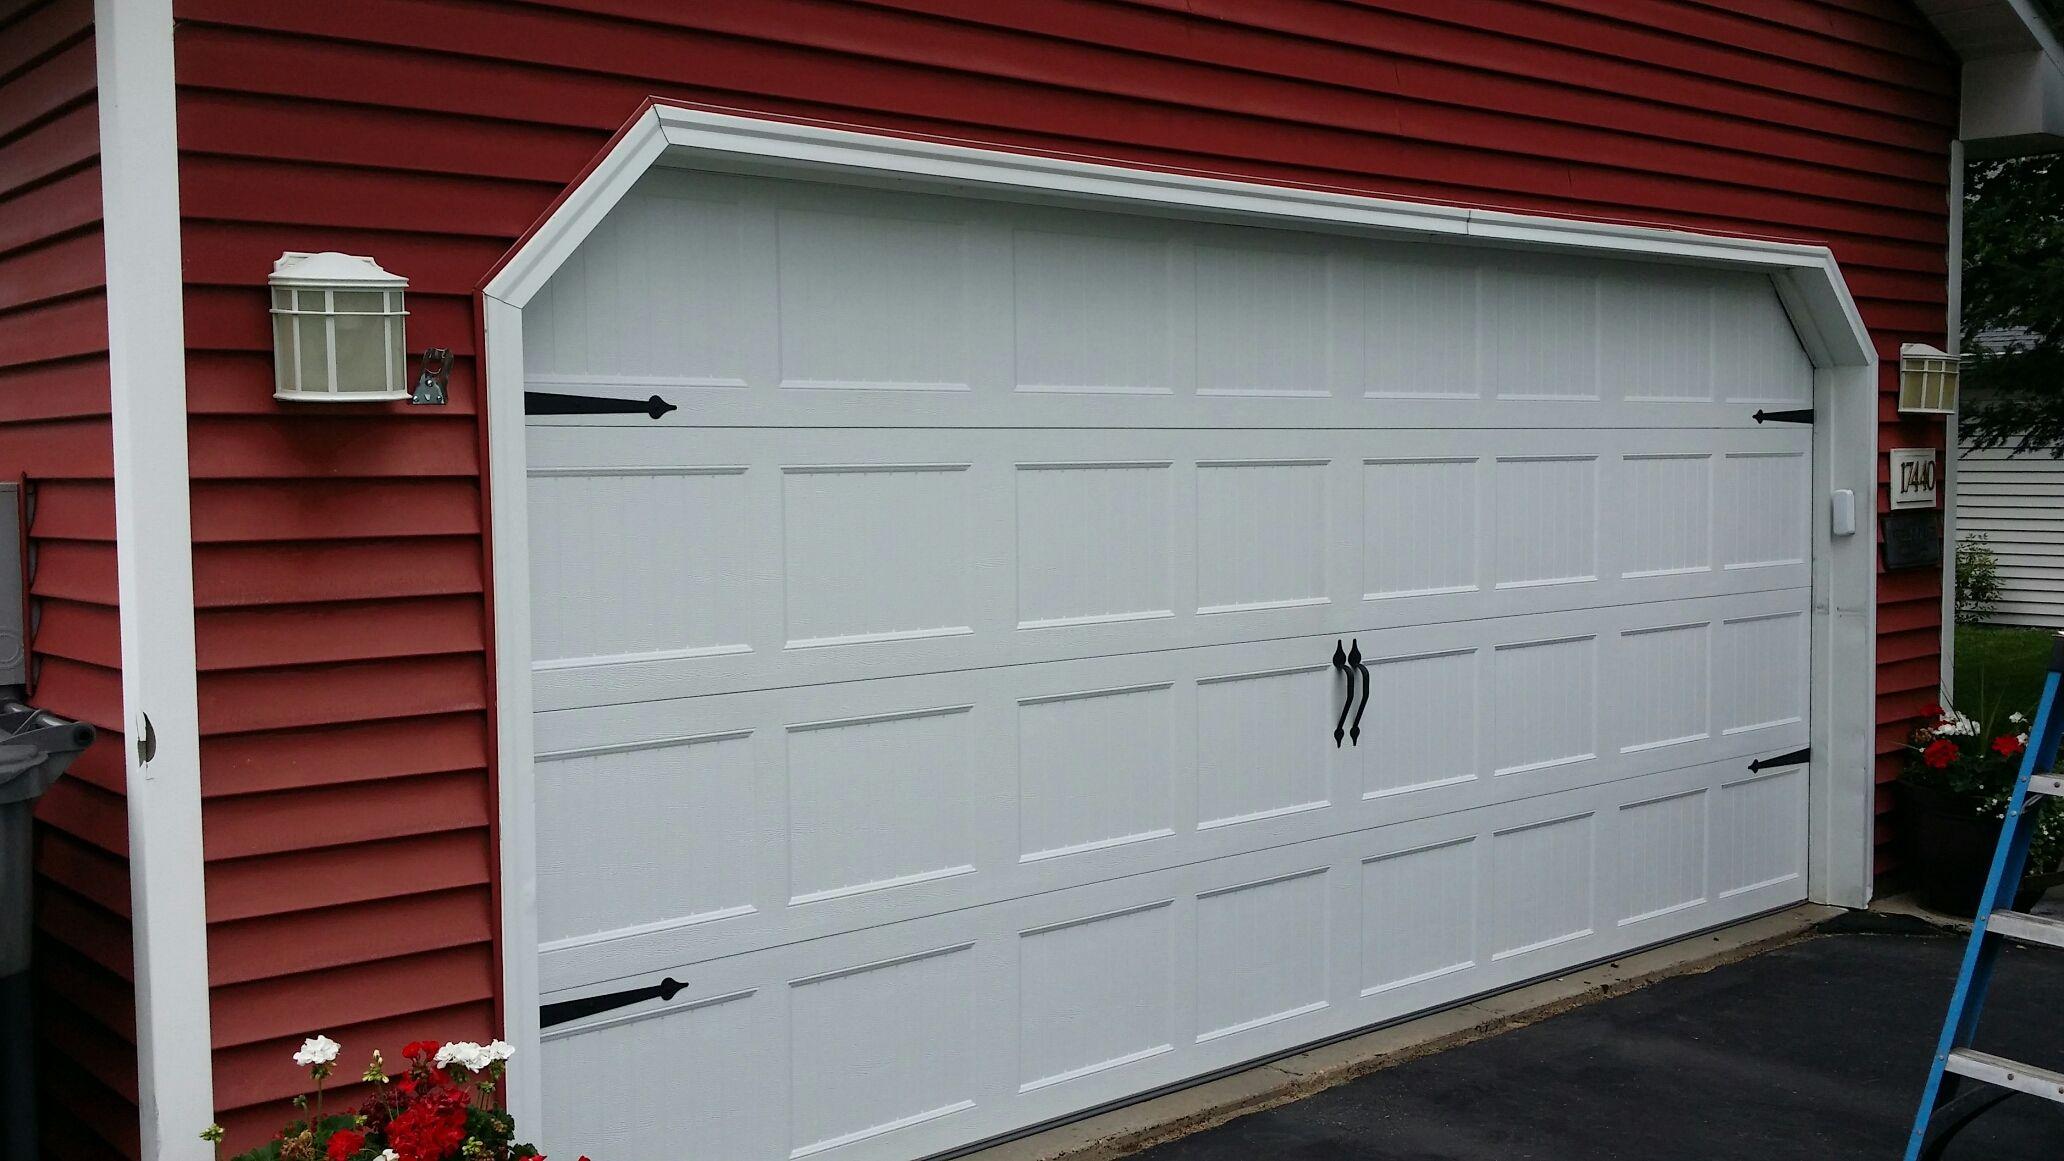 193770 Jpg 2064 1161 Minneapolis St Paul Garage Door Repair